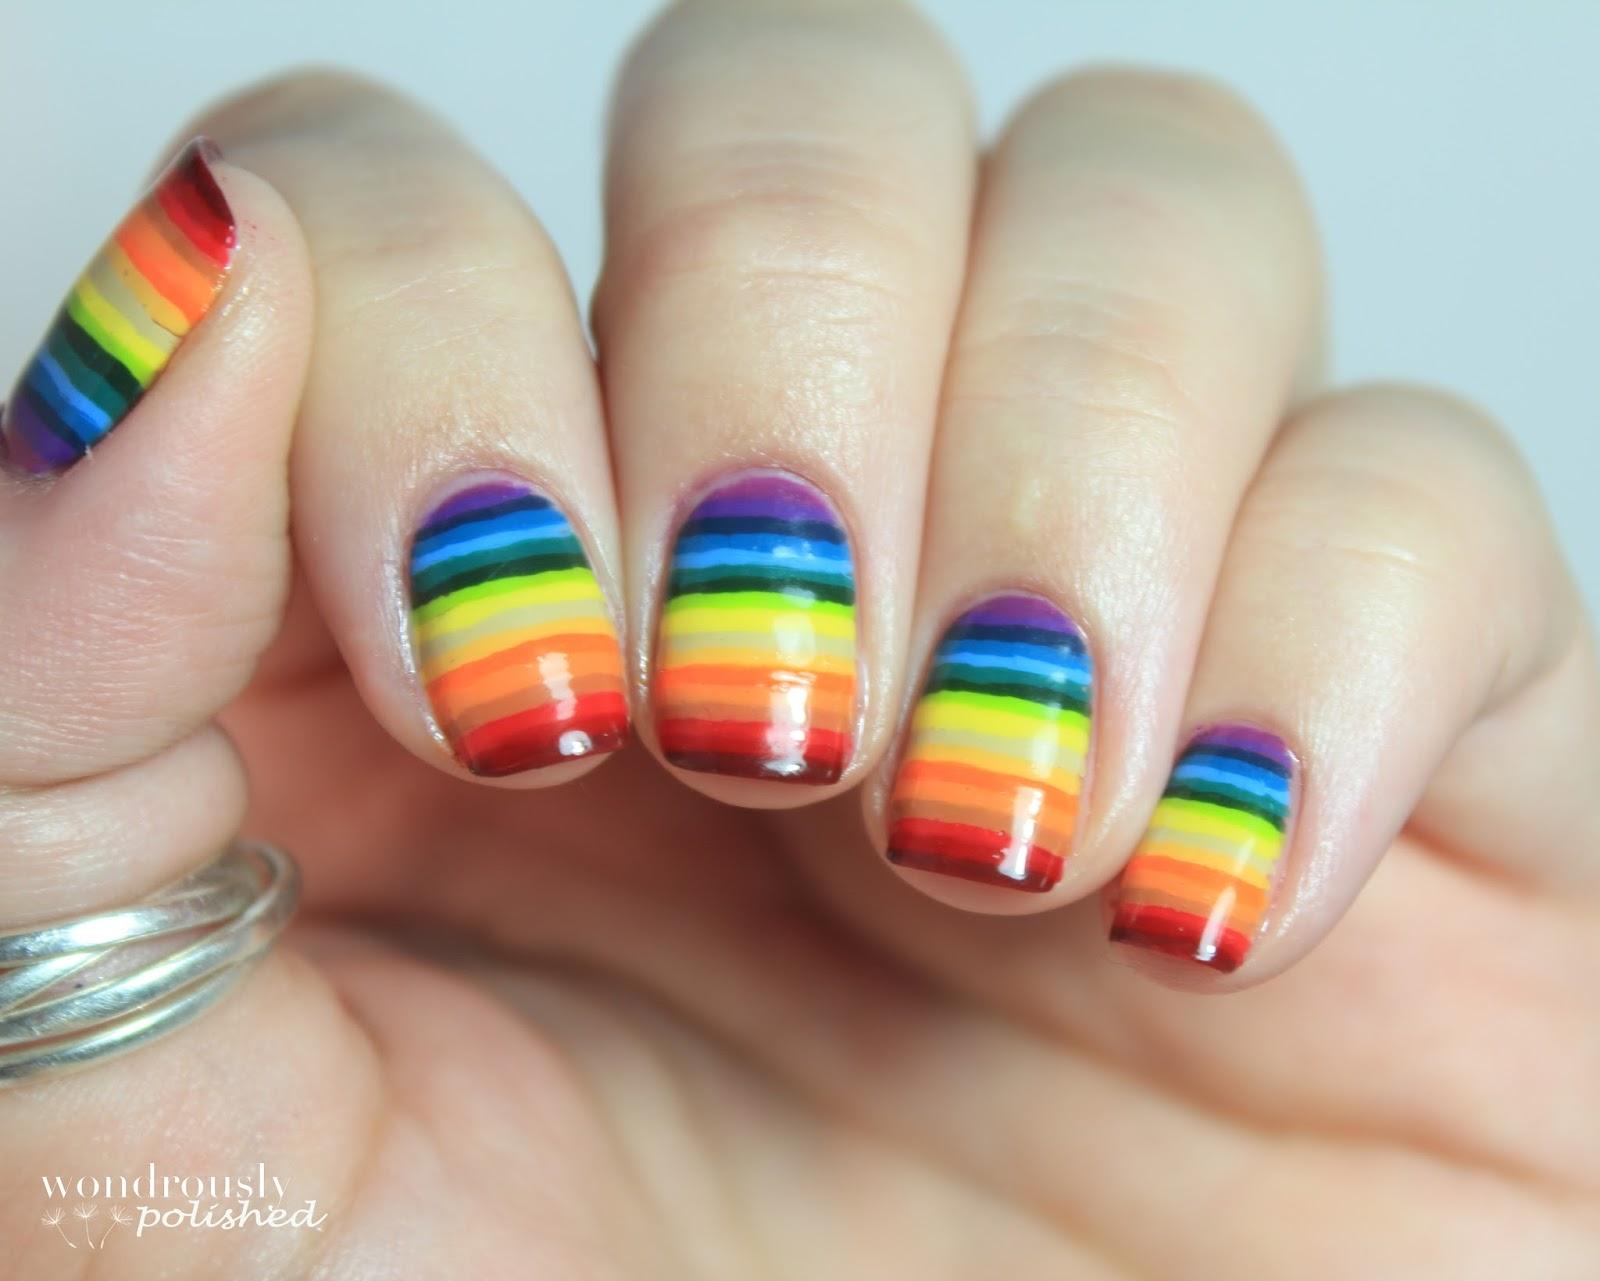 Wondrously Polished: 31 Day Nail Art Challenge - Day 9: Rainbow Nails